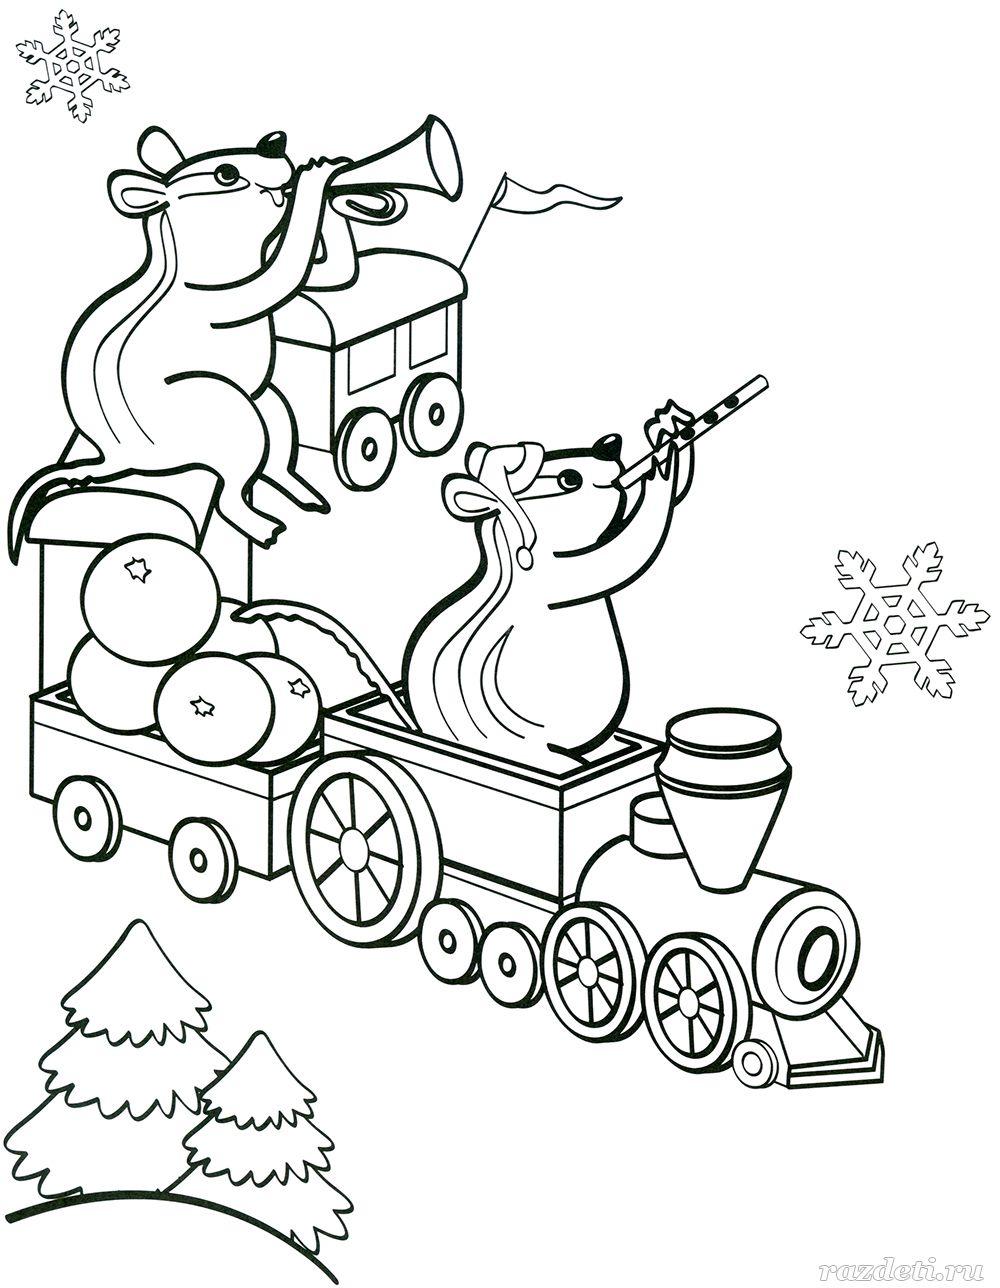 Раскраска на тему Новый год